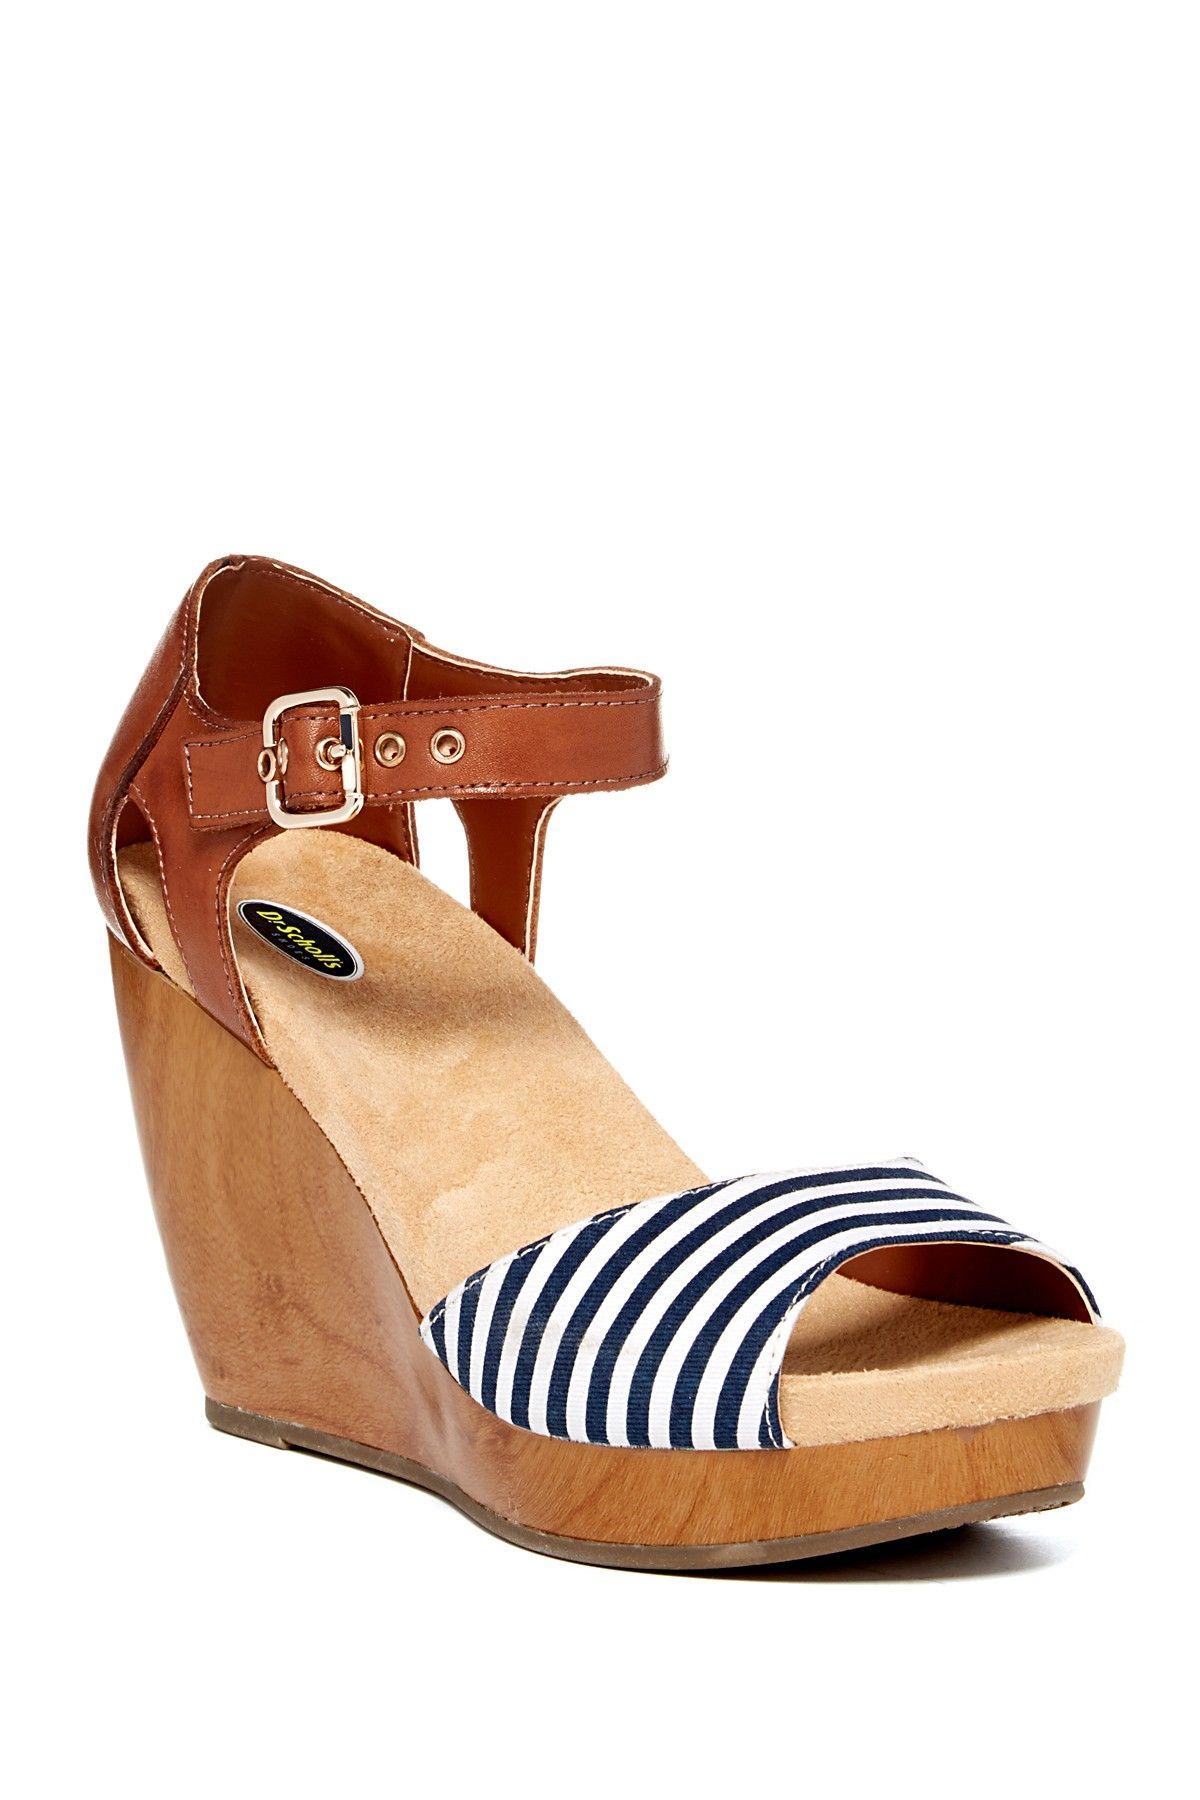 48b33482924 Milestone Platform Wedge Sandal on HauteLook so cute!